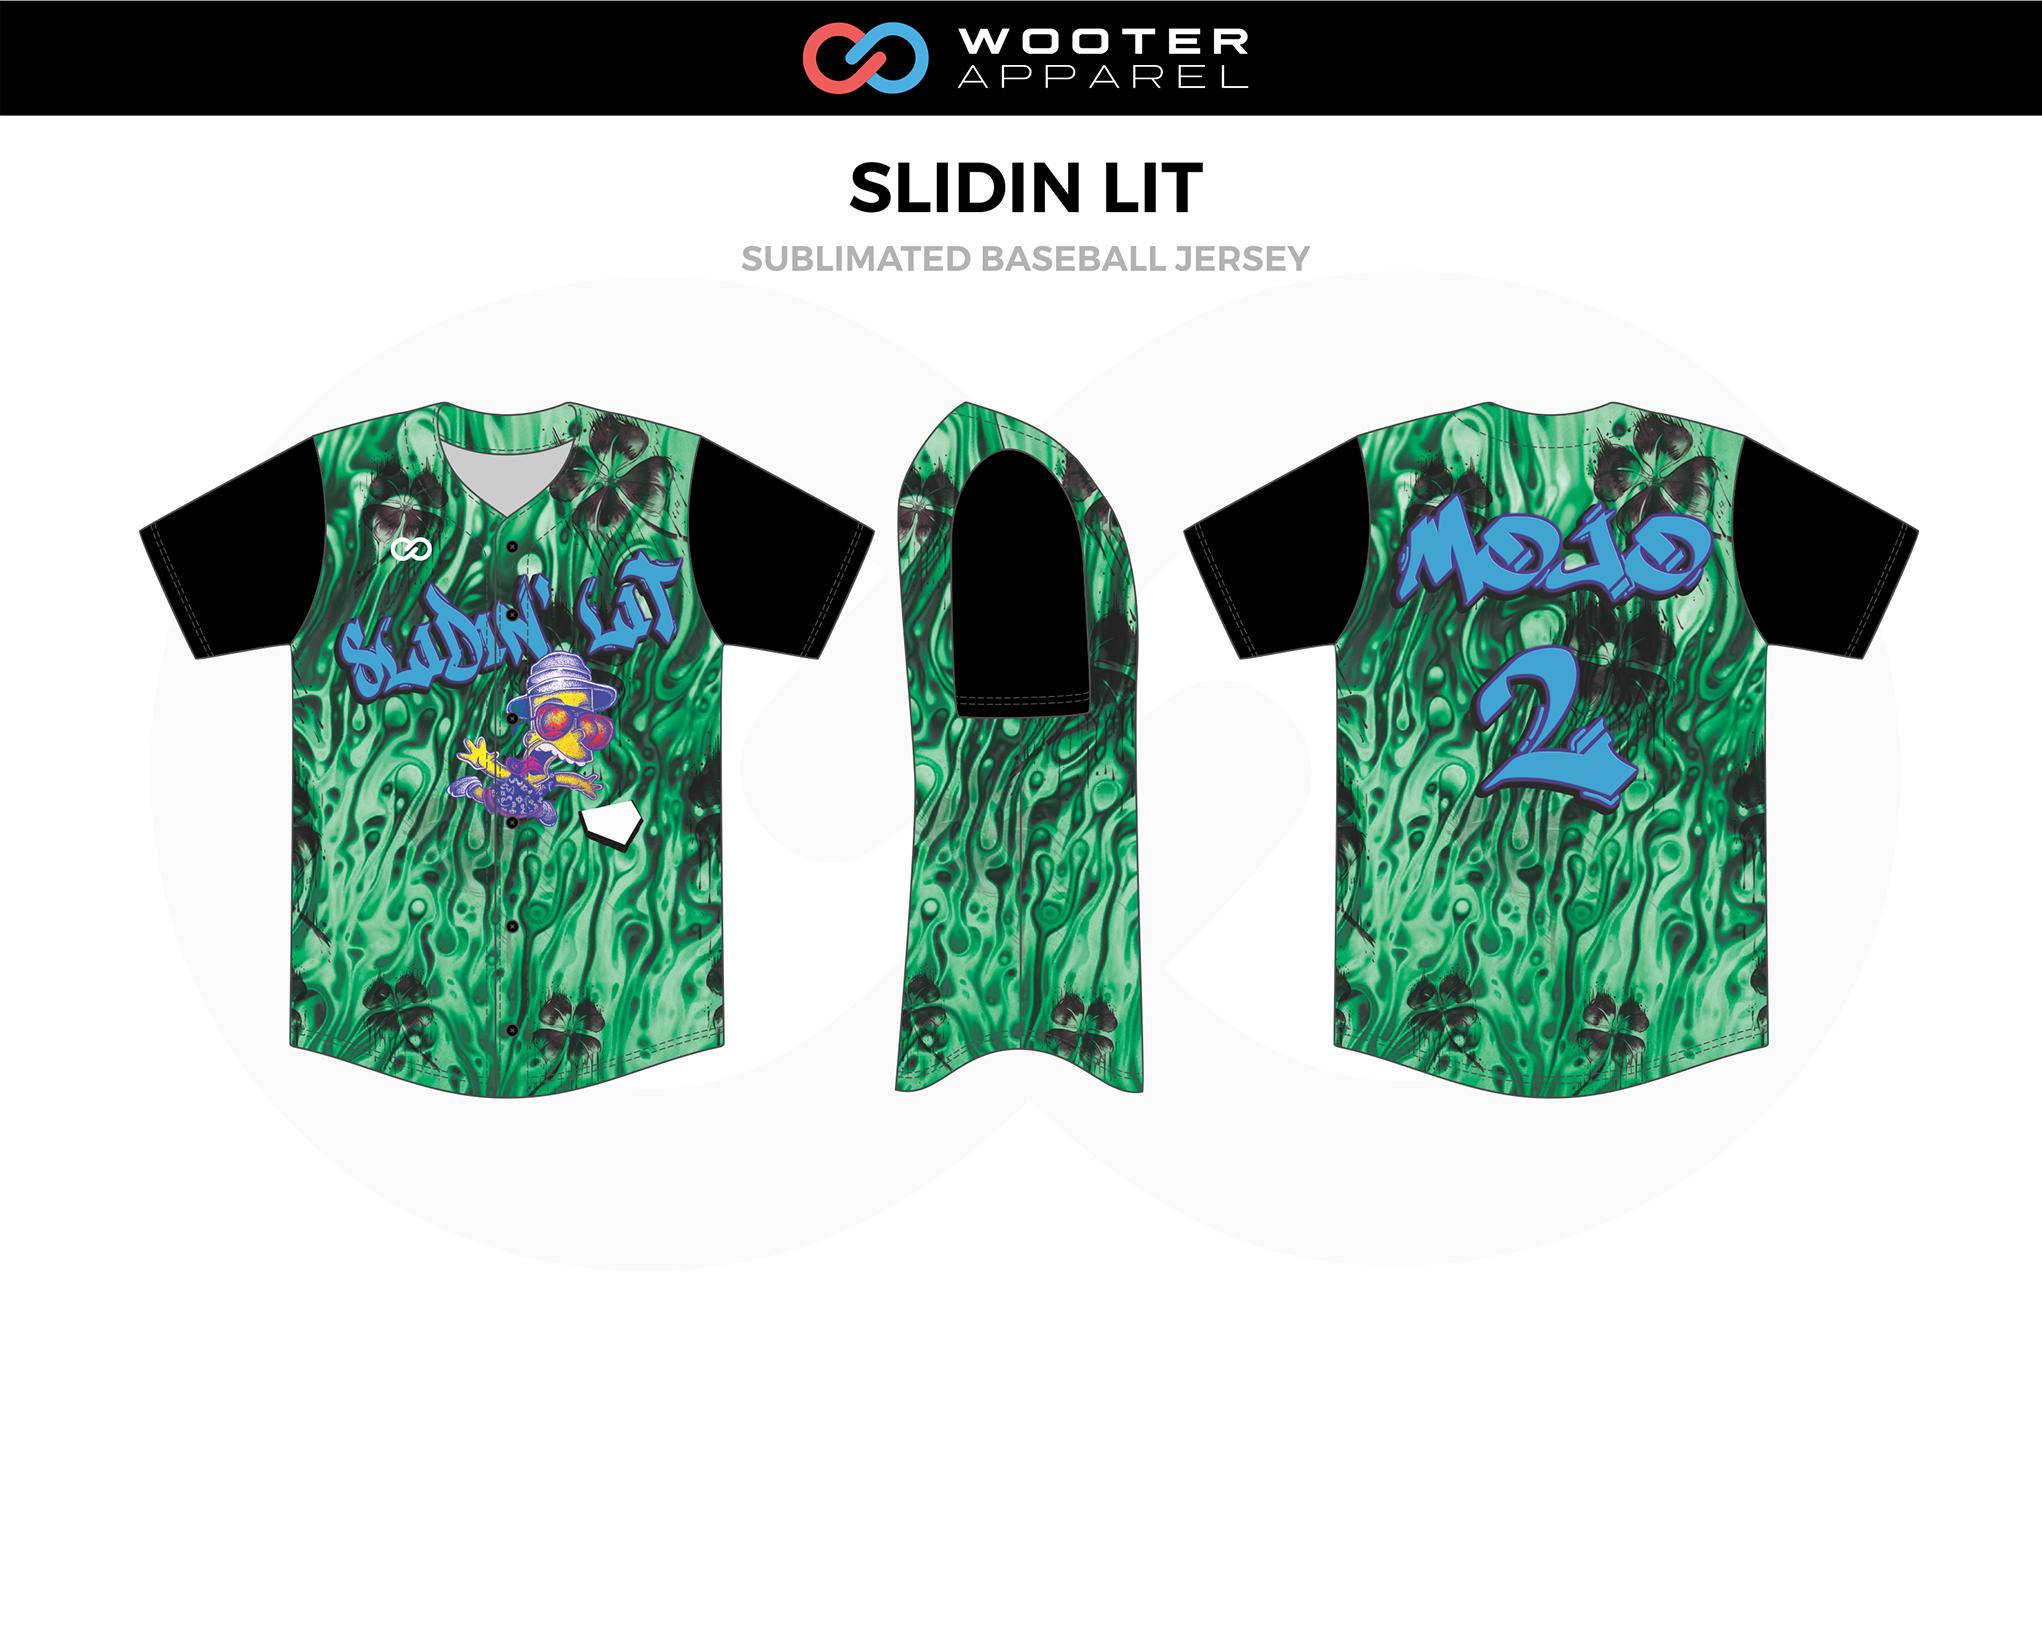 SLIDIN LIT Green Black Blue Sublimated Baseball Jersey Shirt